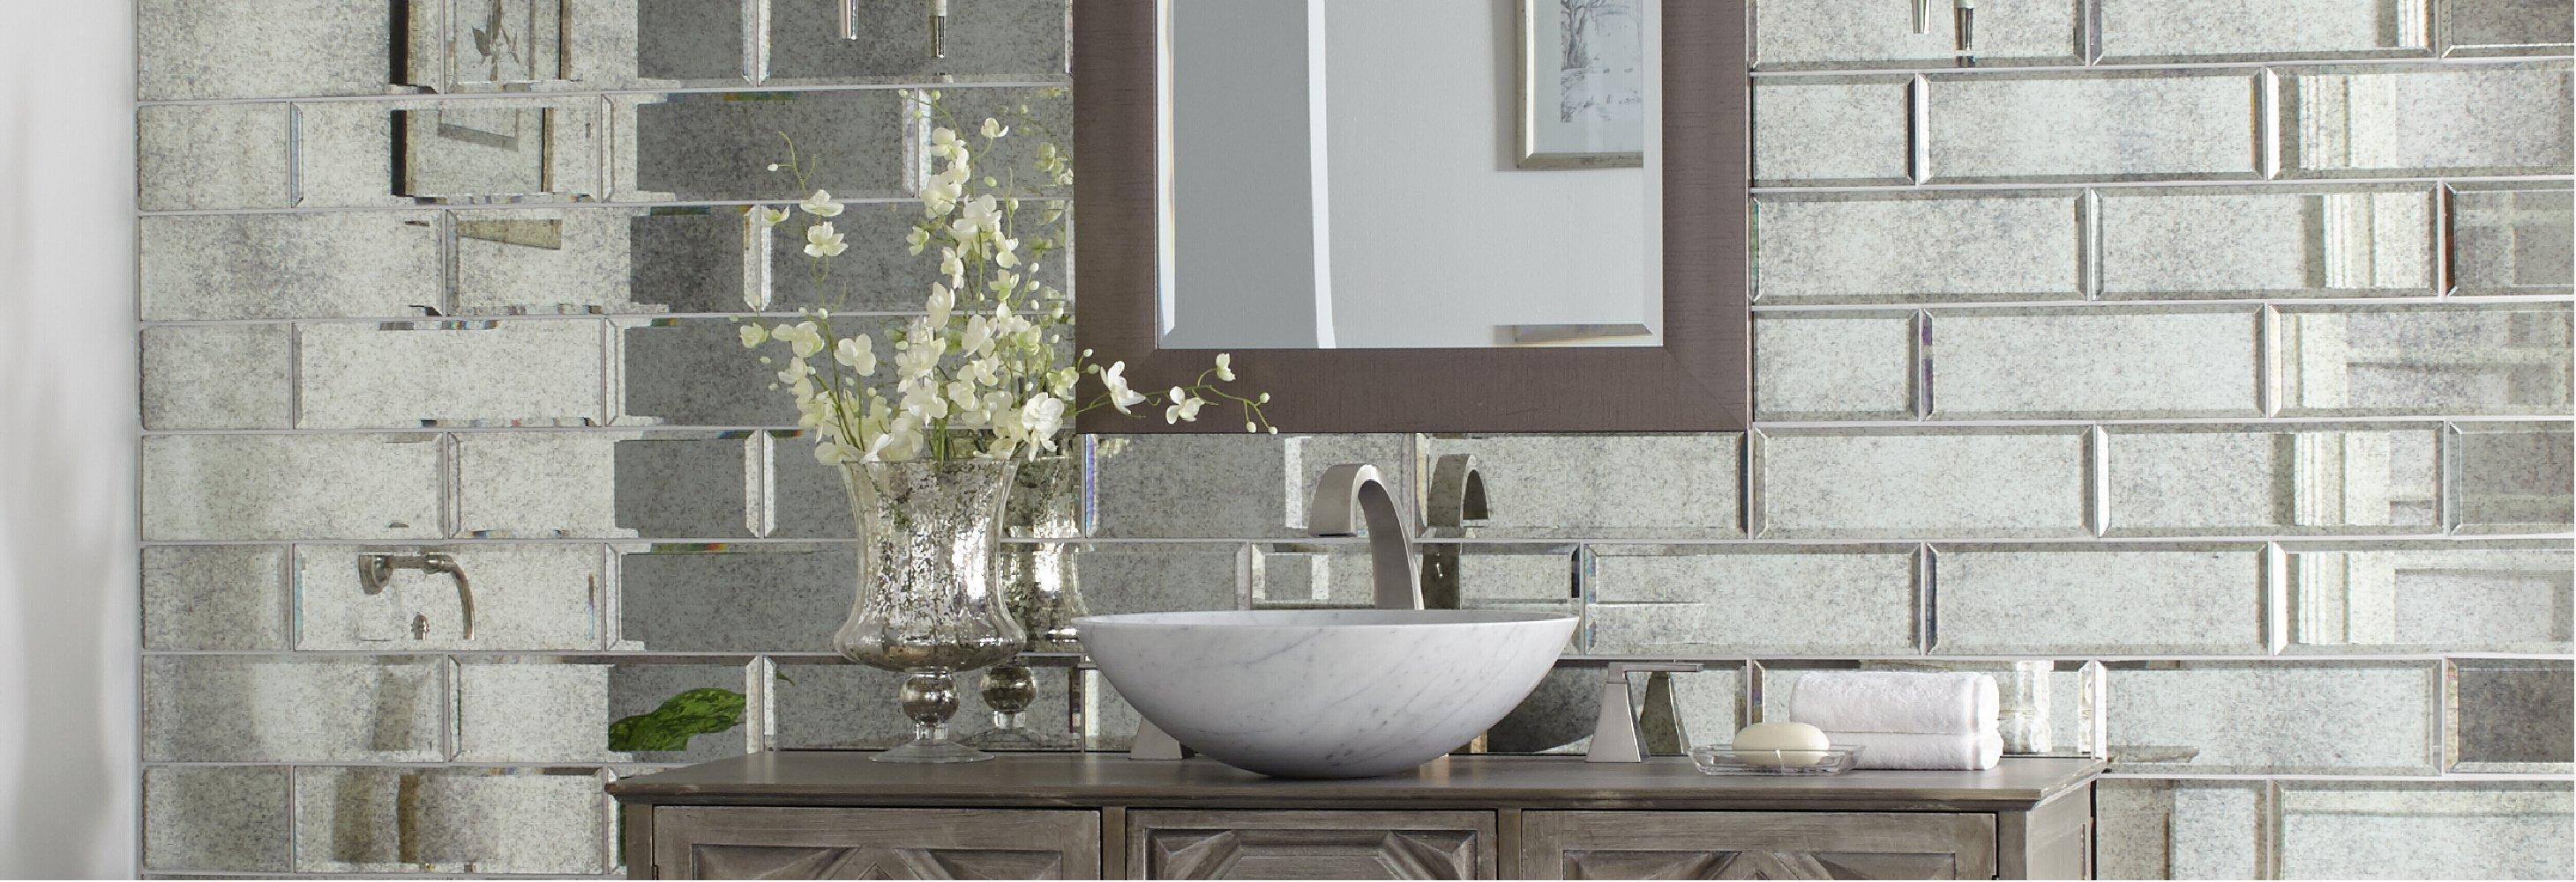 contemporary floor tiles. Delighful Floor Contemporary Tile To Floor Tiles L